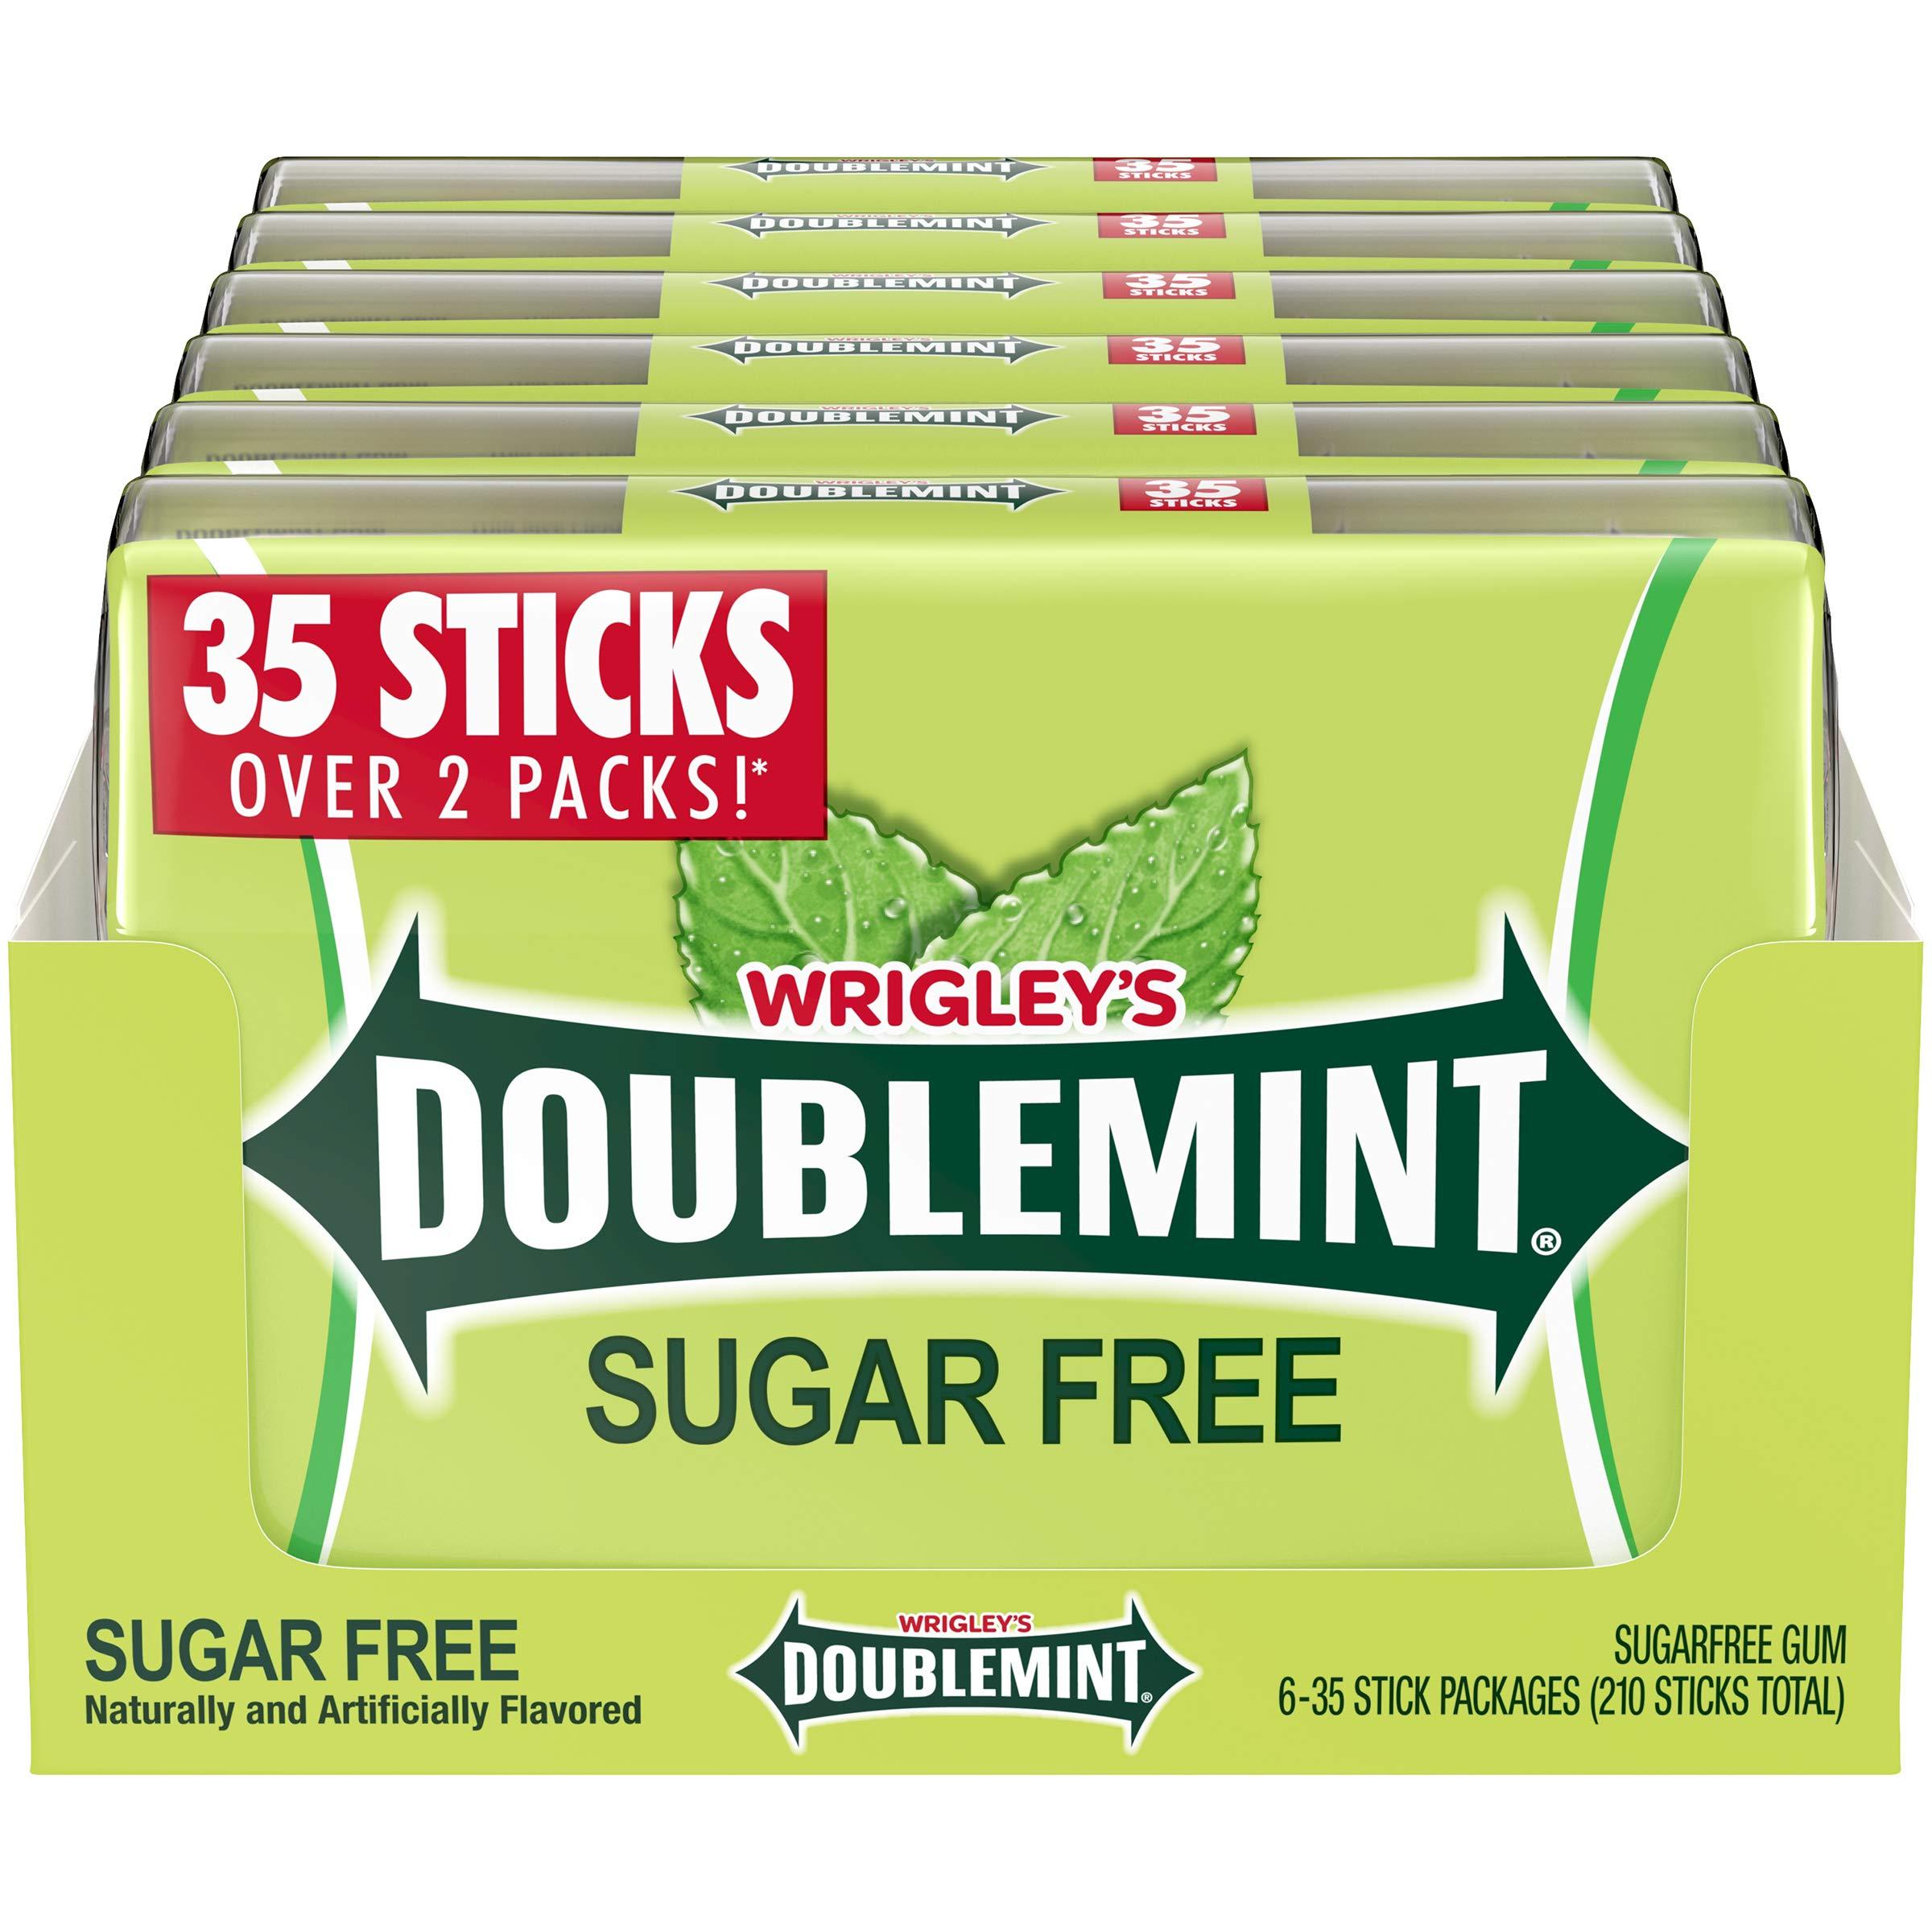 DOUBLEMINT Gum 35 stick SugarFree MegaPack 4.7 oz. (Pack of 6), 87 ounces by Doublemint Gum